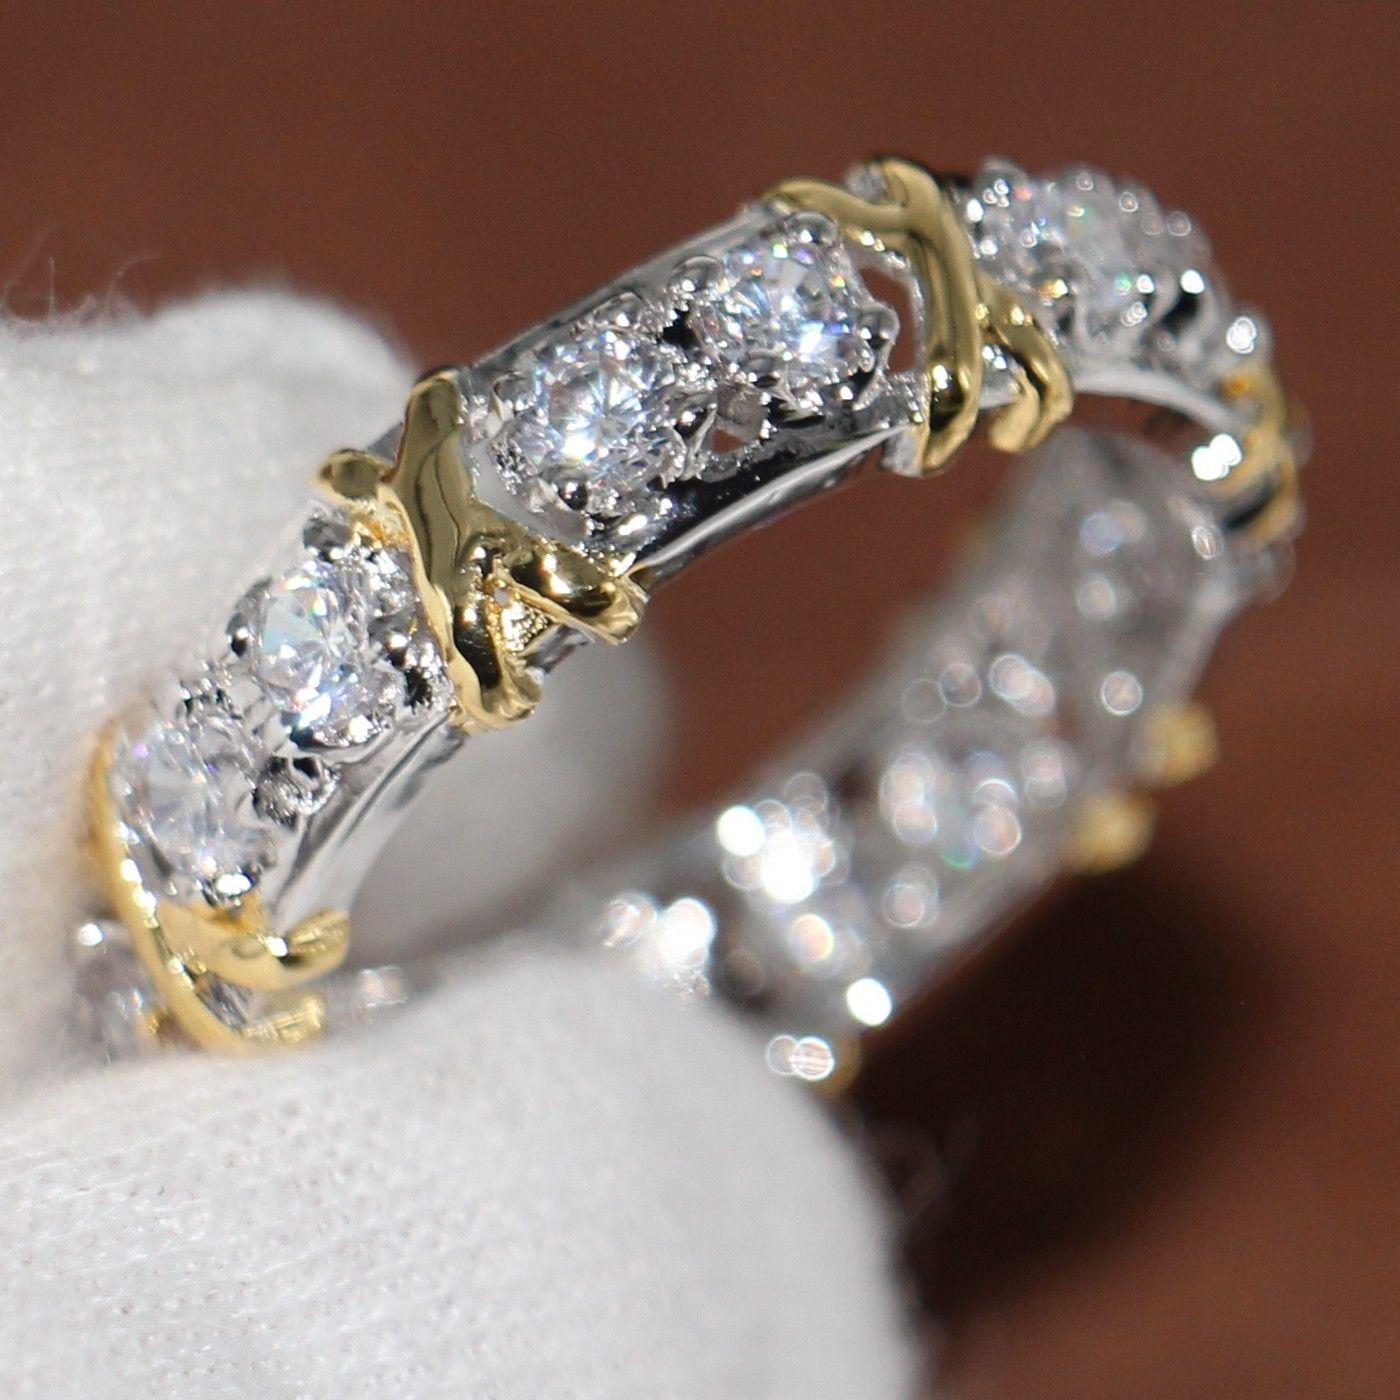 Venta al por mayor Eternidad Profesional Diamonique CZ Diamante simulado 10kt Whiteyellow Gold Lleno de banda de boda Tamaño de anillo 5-11